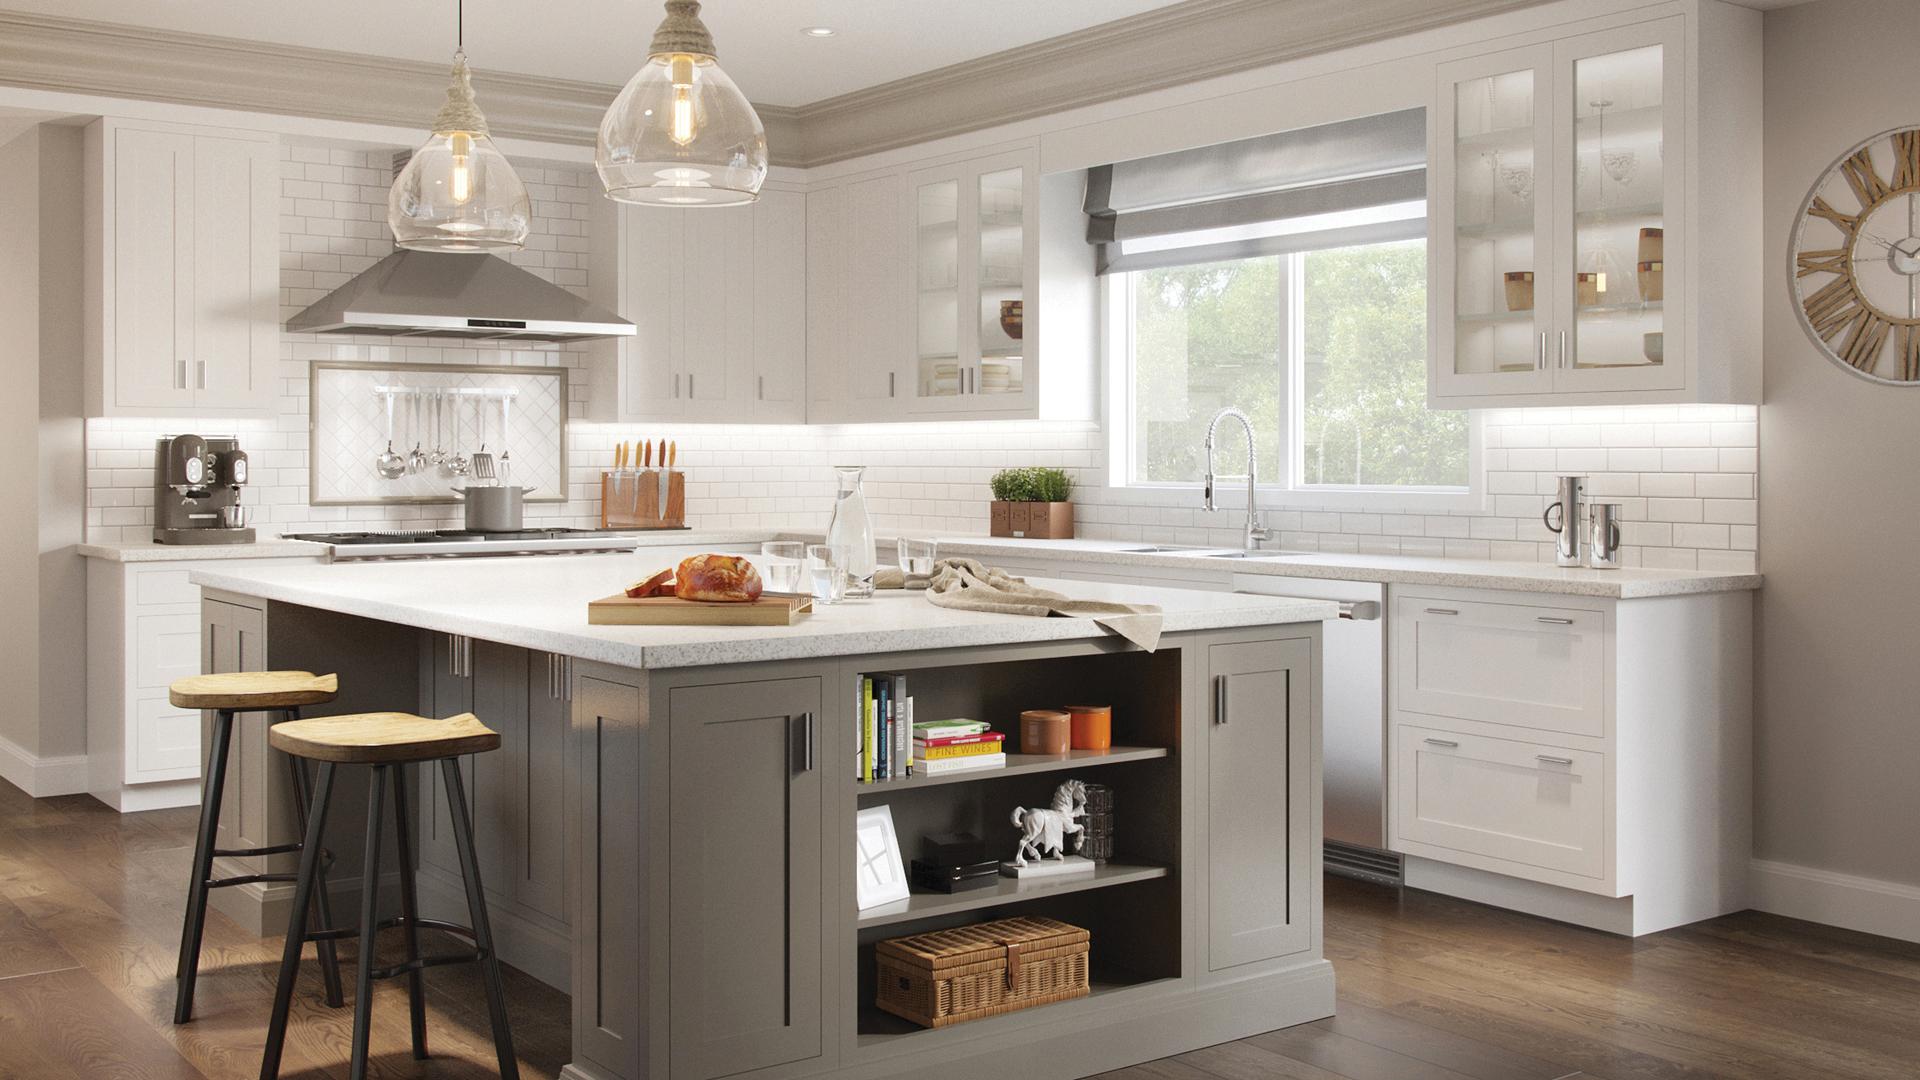 Signature Austin Shaker cabinets in Cloud White and Studio Gray